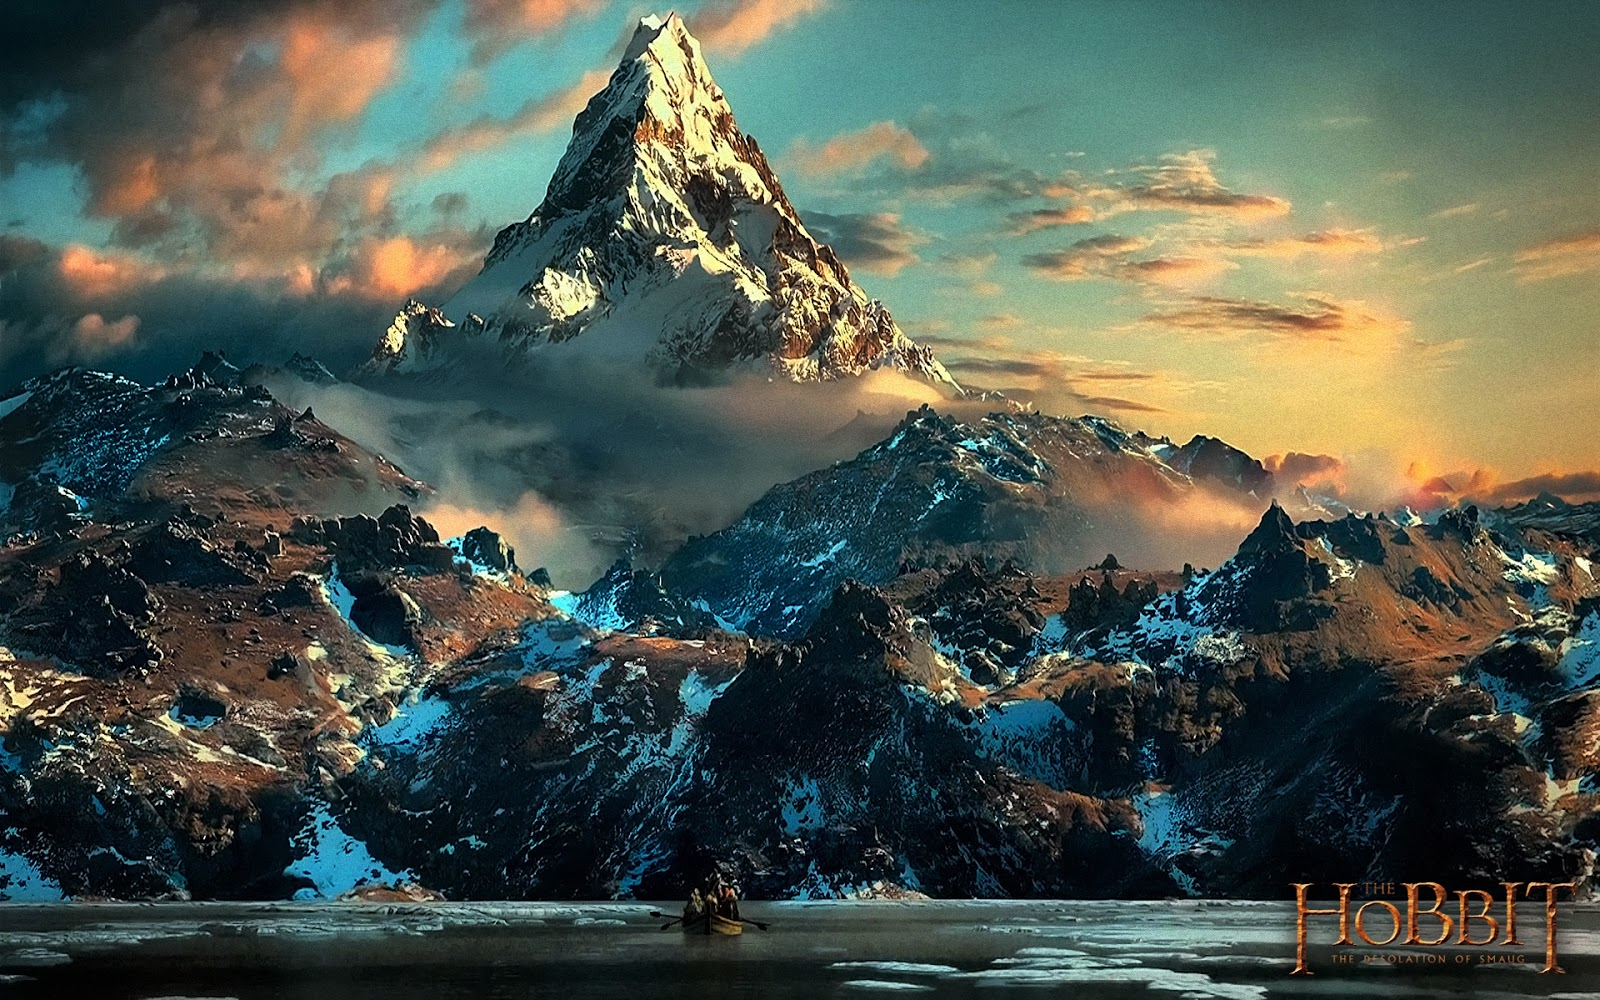 The lonely mountain walpaper image the fellowship mod db - La ilaha illallah hd wallpaper ...